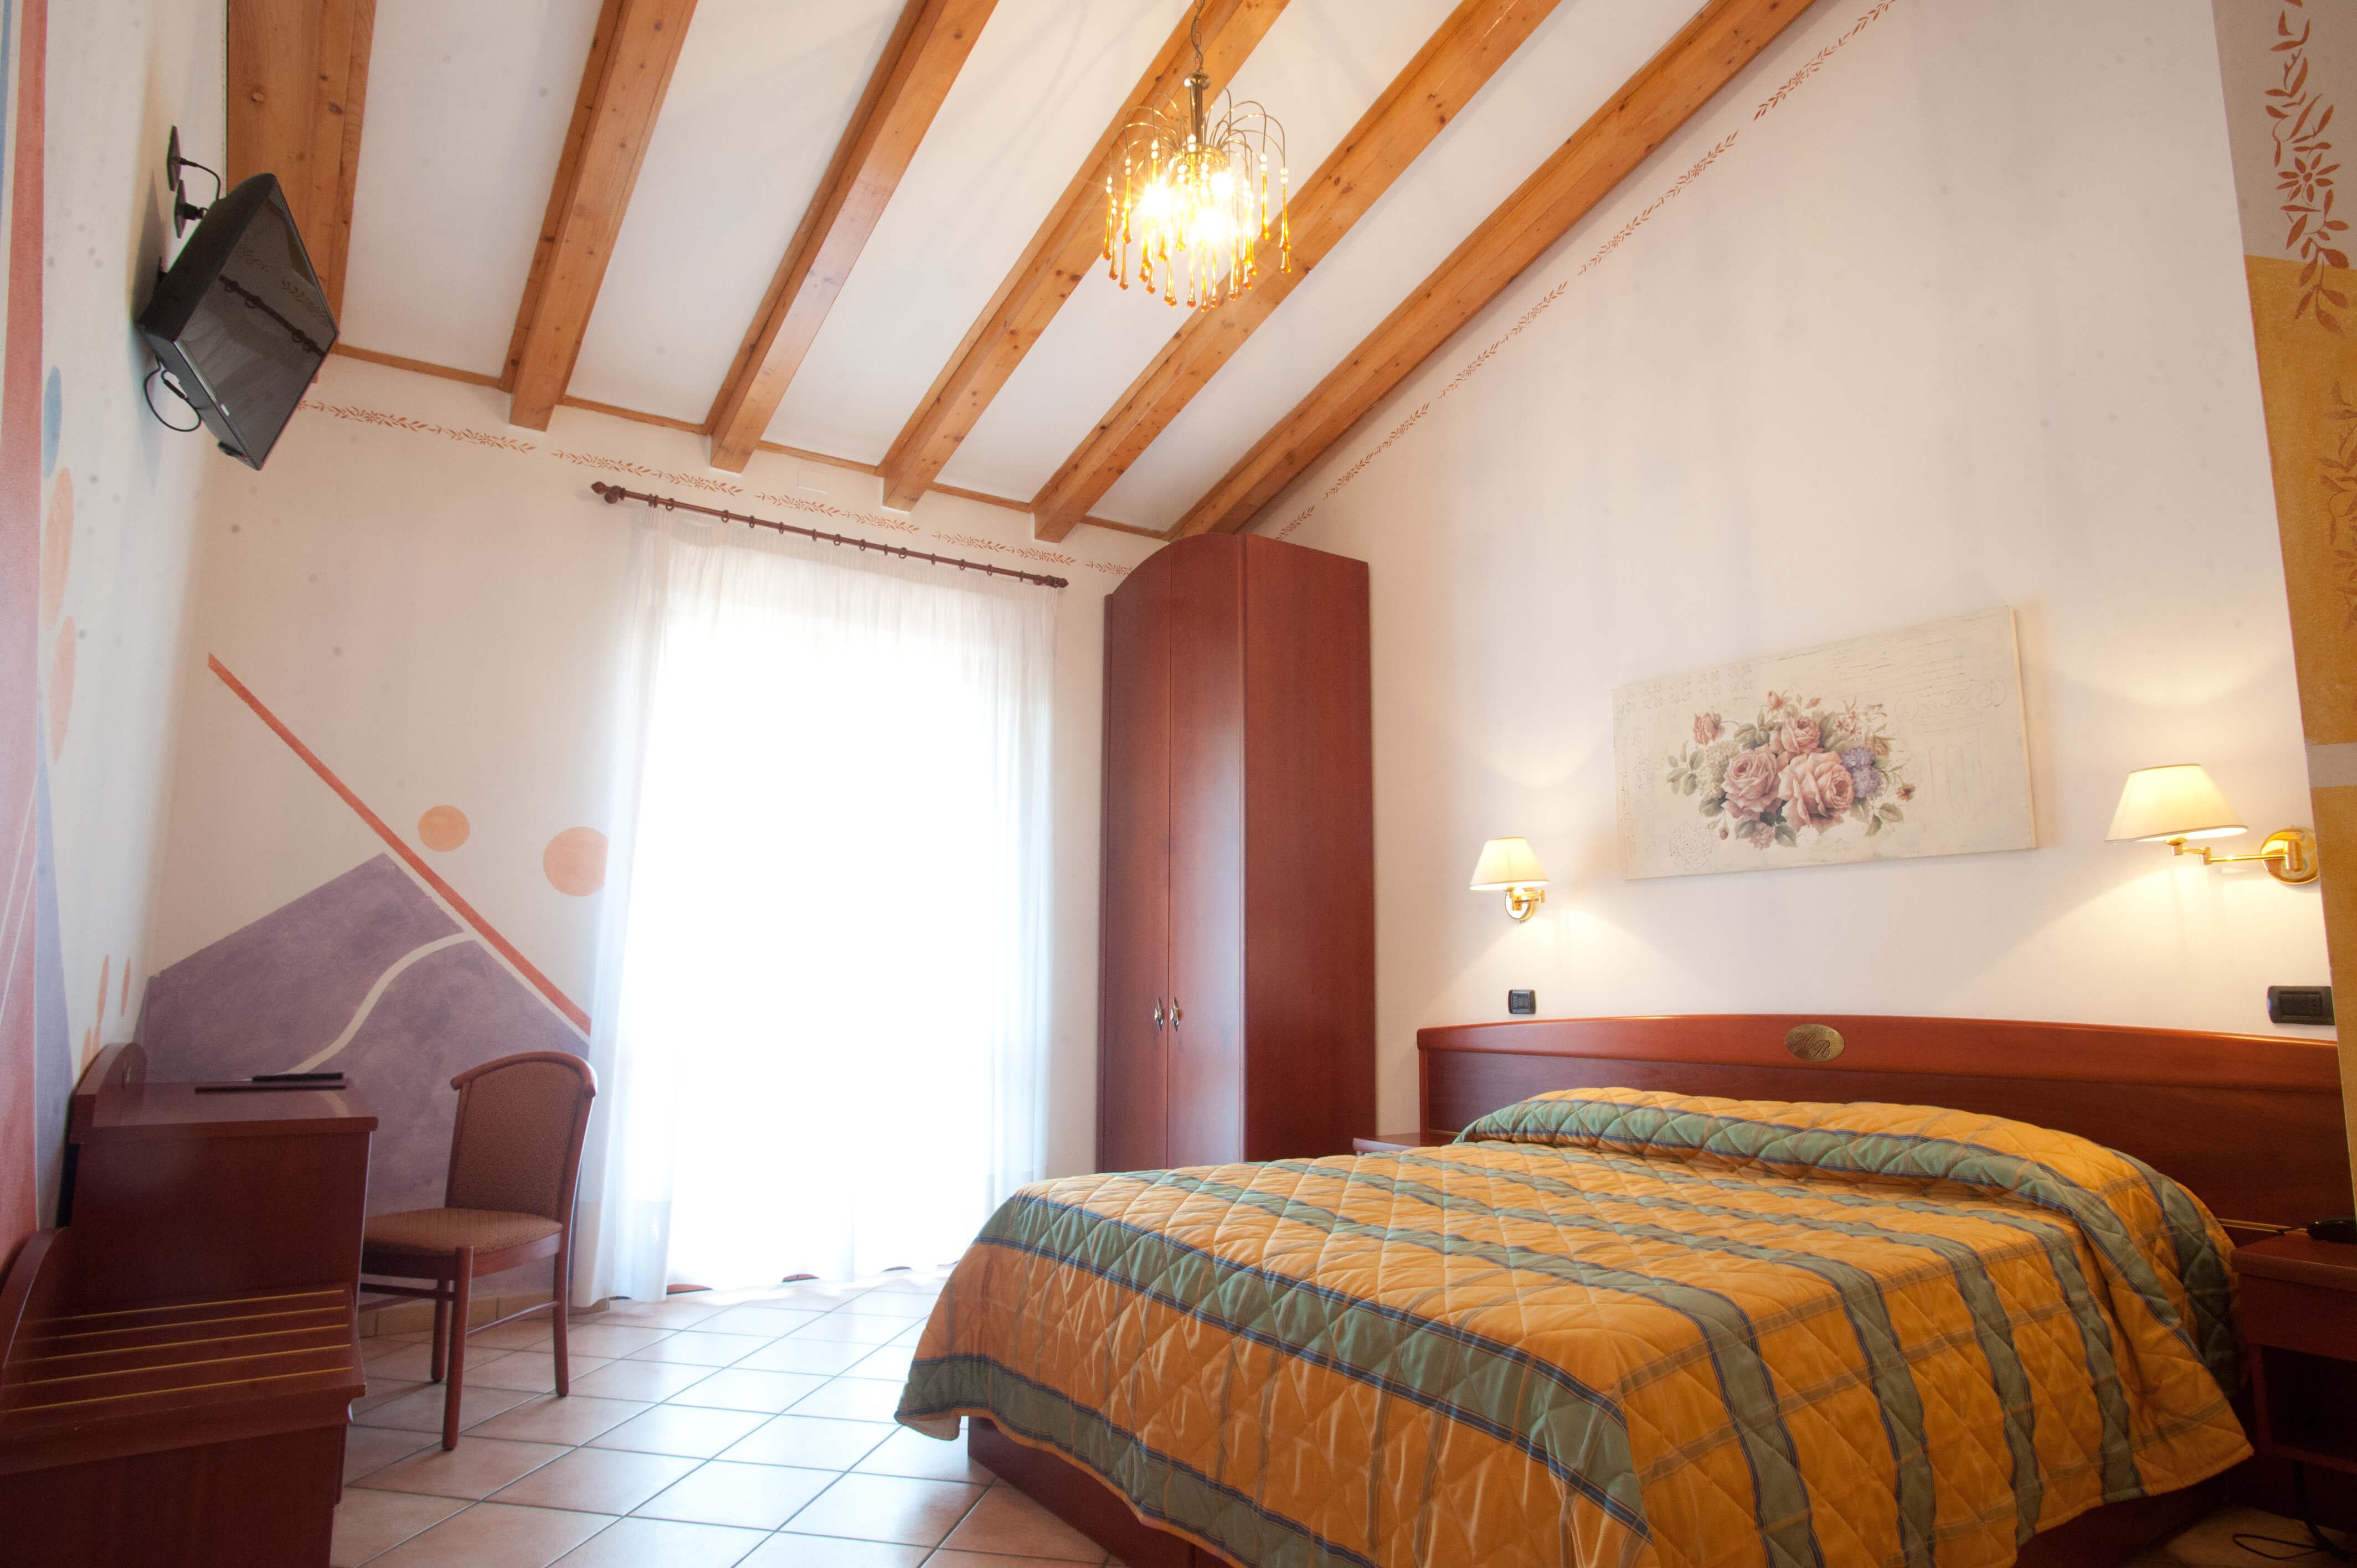 Superior zimmer hotel romantic cavaion veronese lago for Superior zimmer